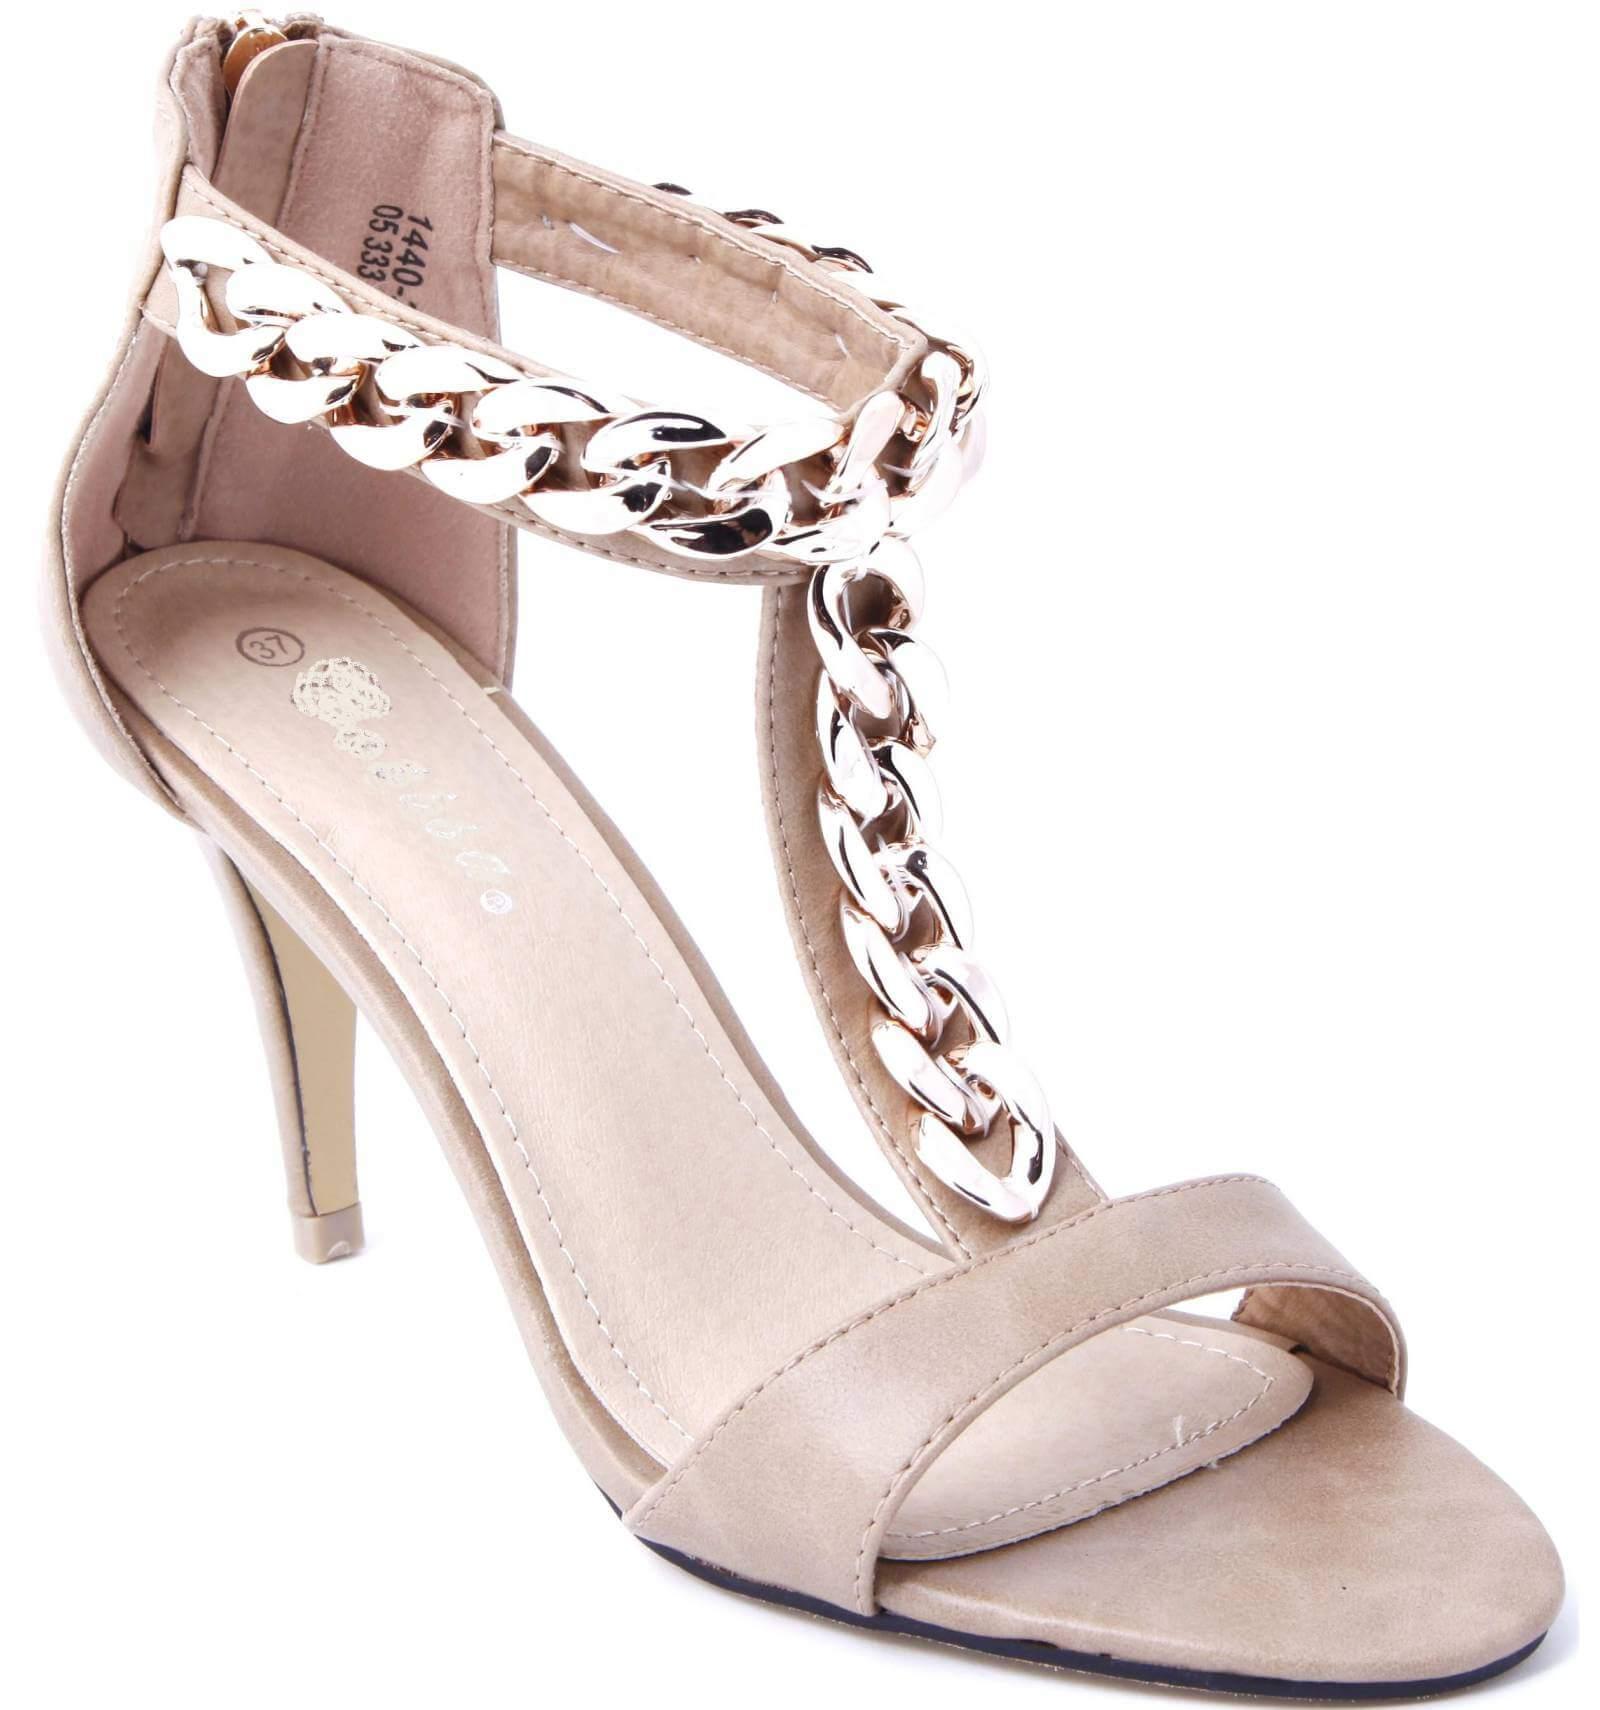 sandale femme simili cuir taupe talon avec cha ne dor e. Black Bedroom Furniture Sets. Home Design Ideas